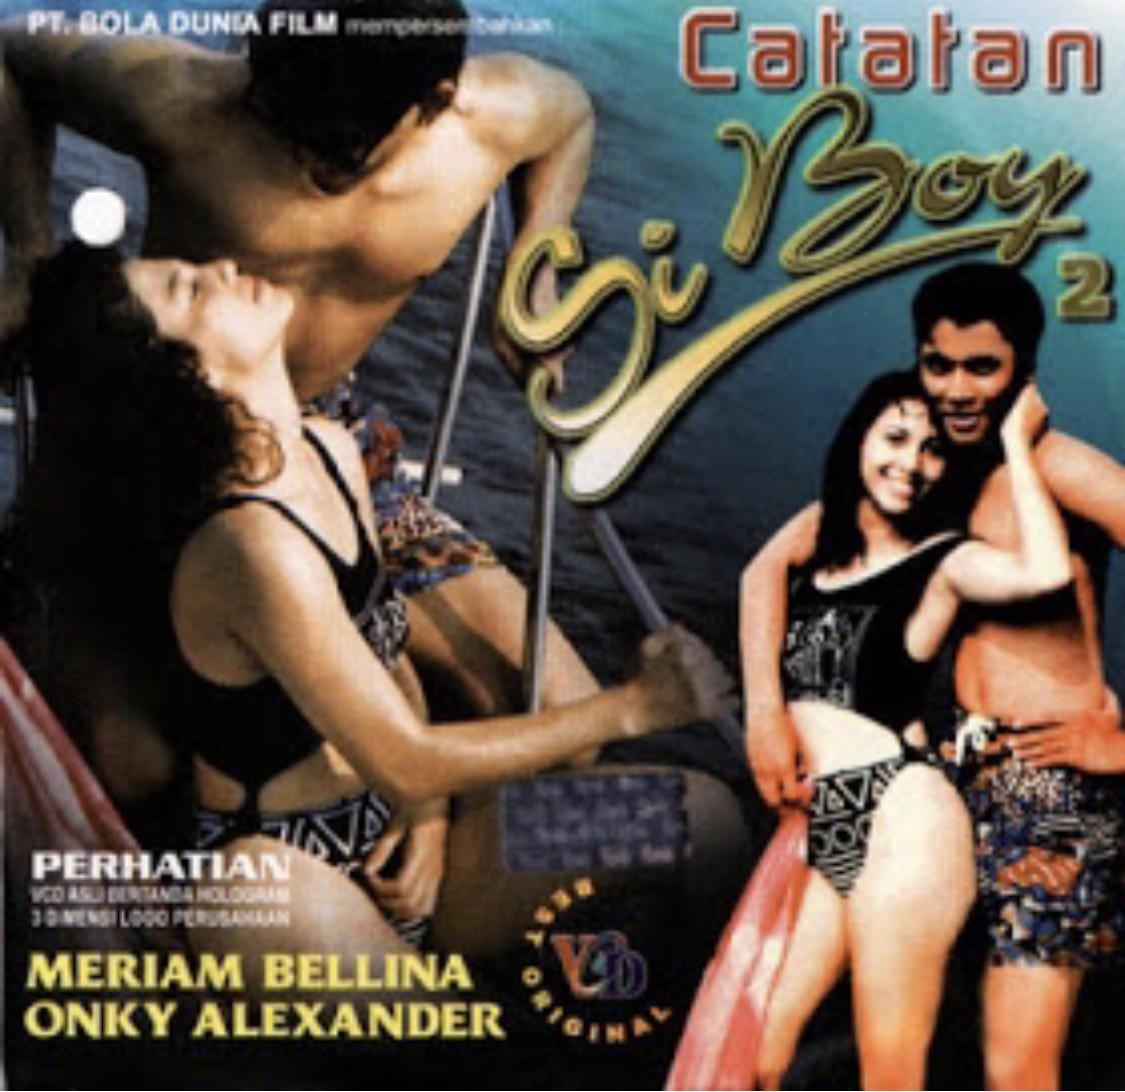 Catatan Si Boy 2 ((1988))